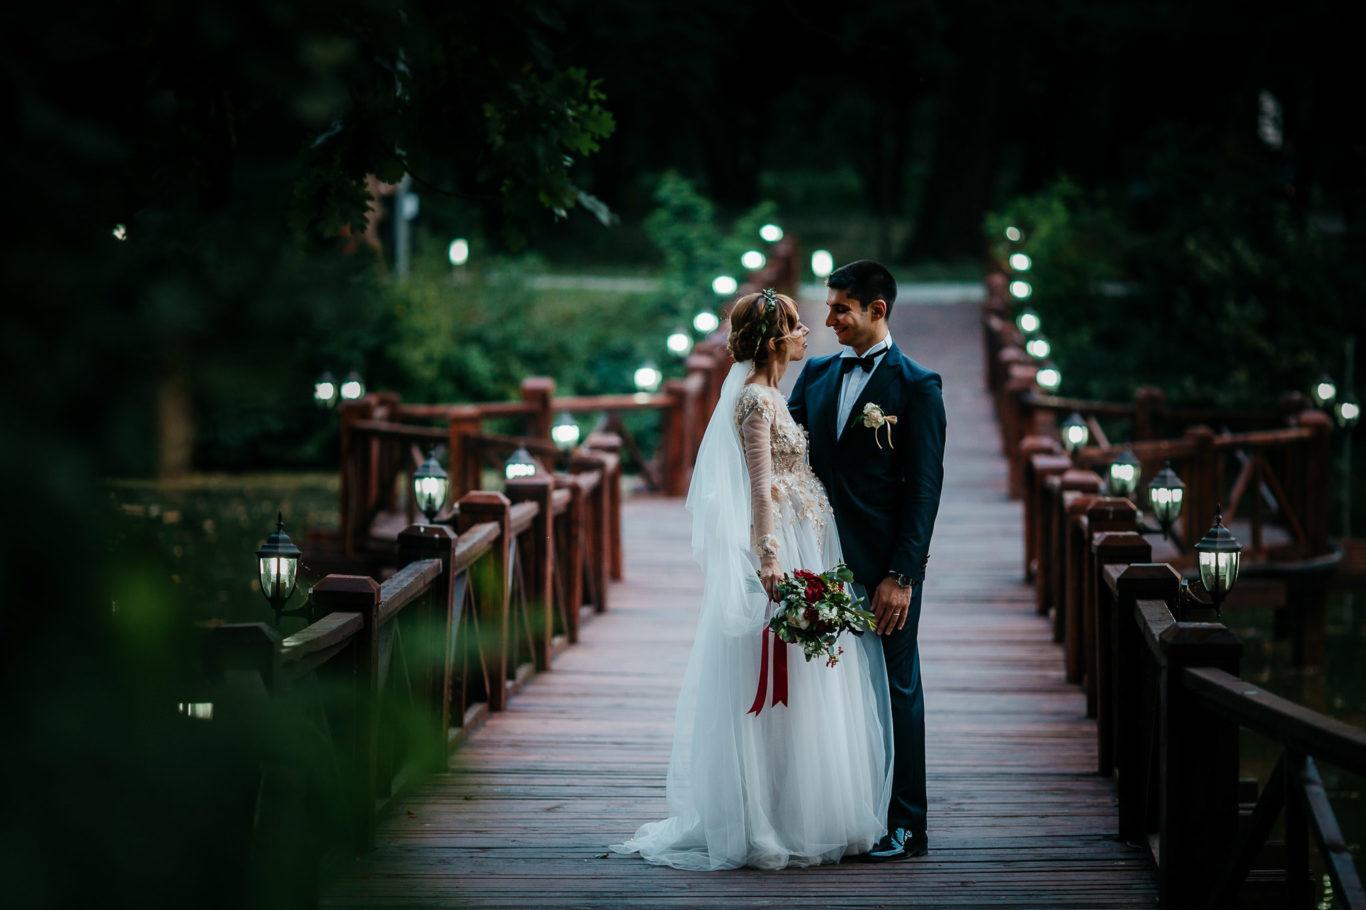 0459-Fotografie-nunta-Stirbey-Laura-Rares-fotograf-Ciprian-Dumitrescu-DCF_4039